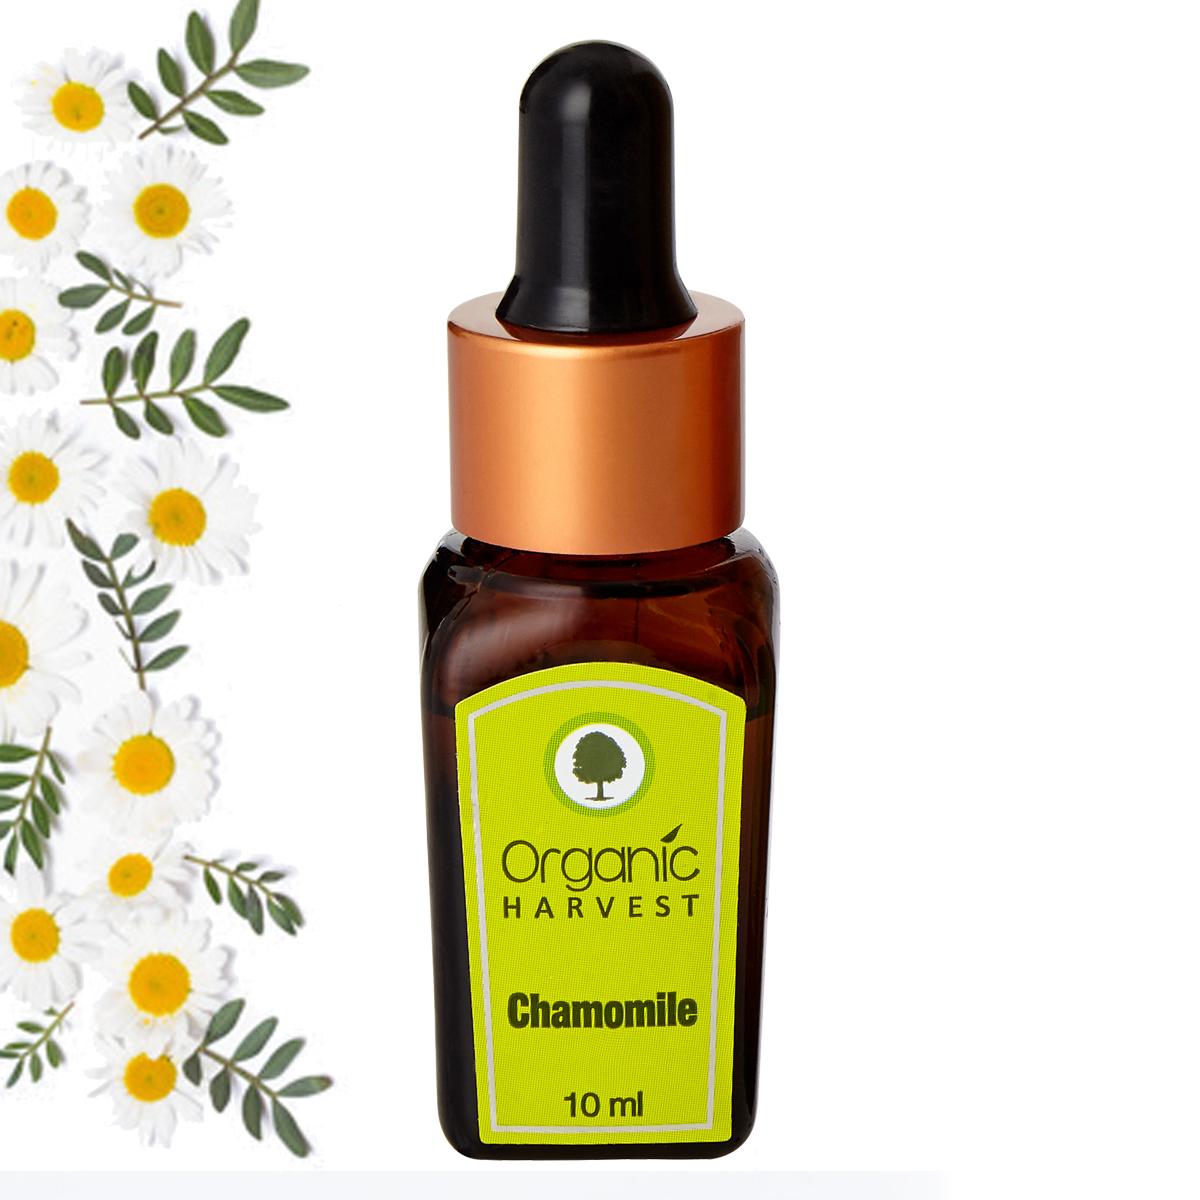 Organic Harvest | Chamomile Essential Oil - 10ml